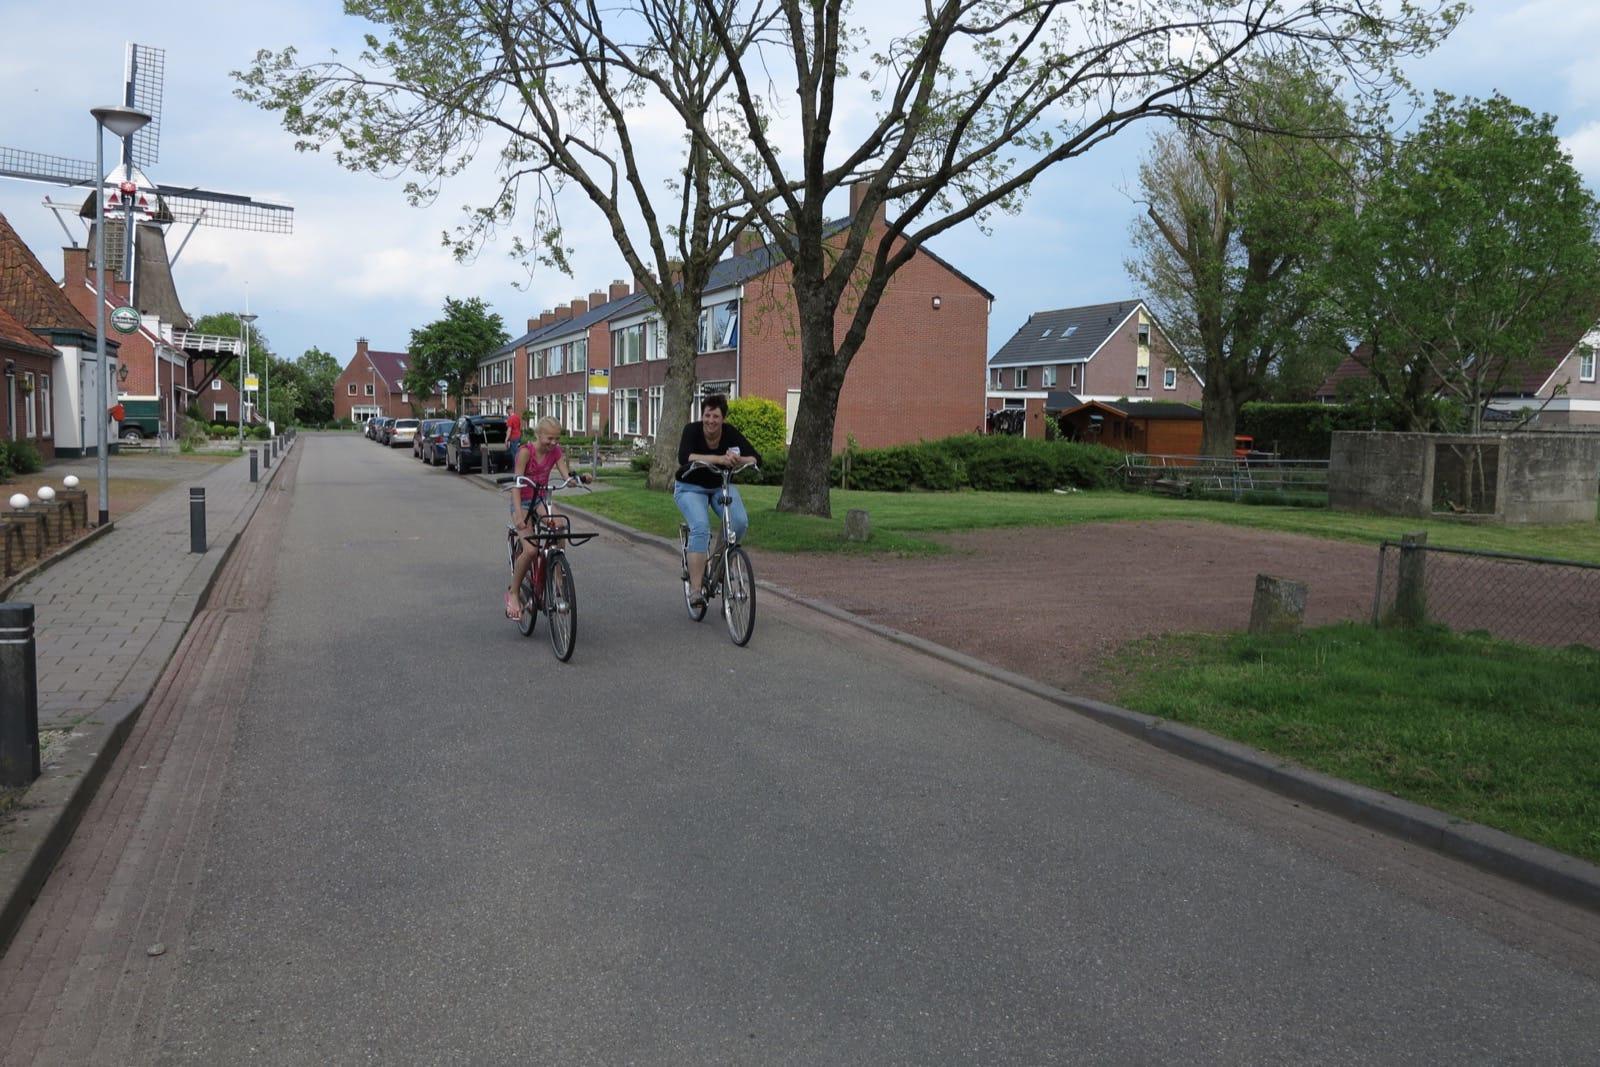 et-fiets-en-fietser-37-titia-van-zanten-en-dochter-oi.jpg